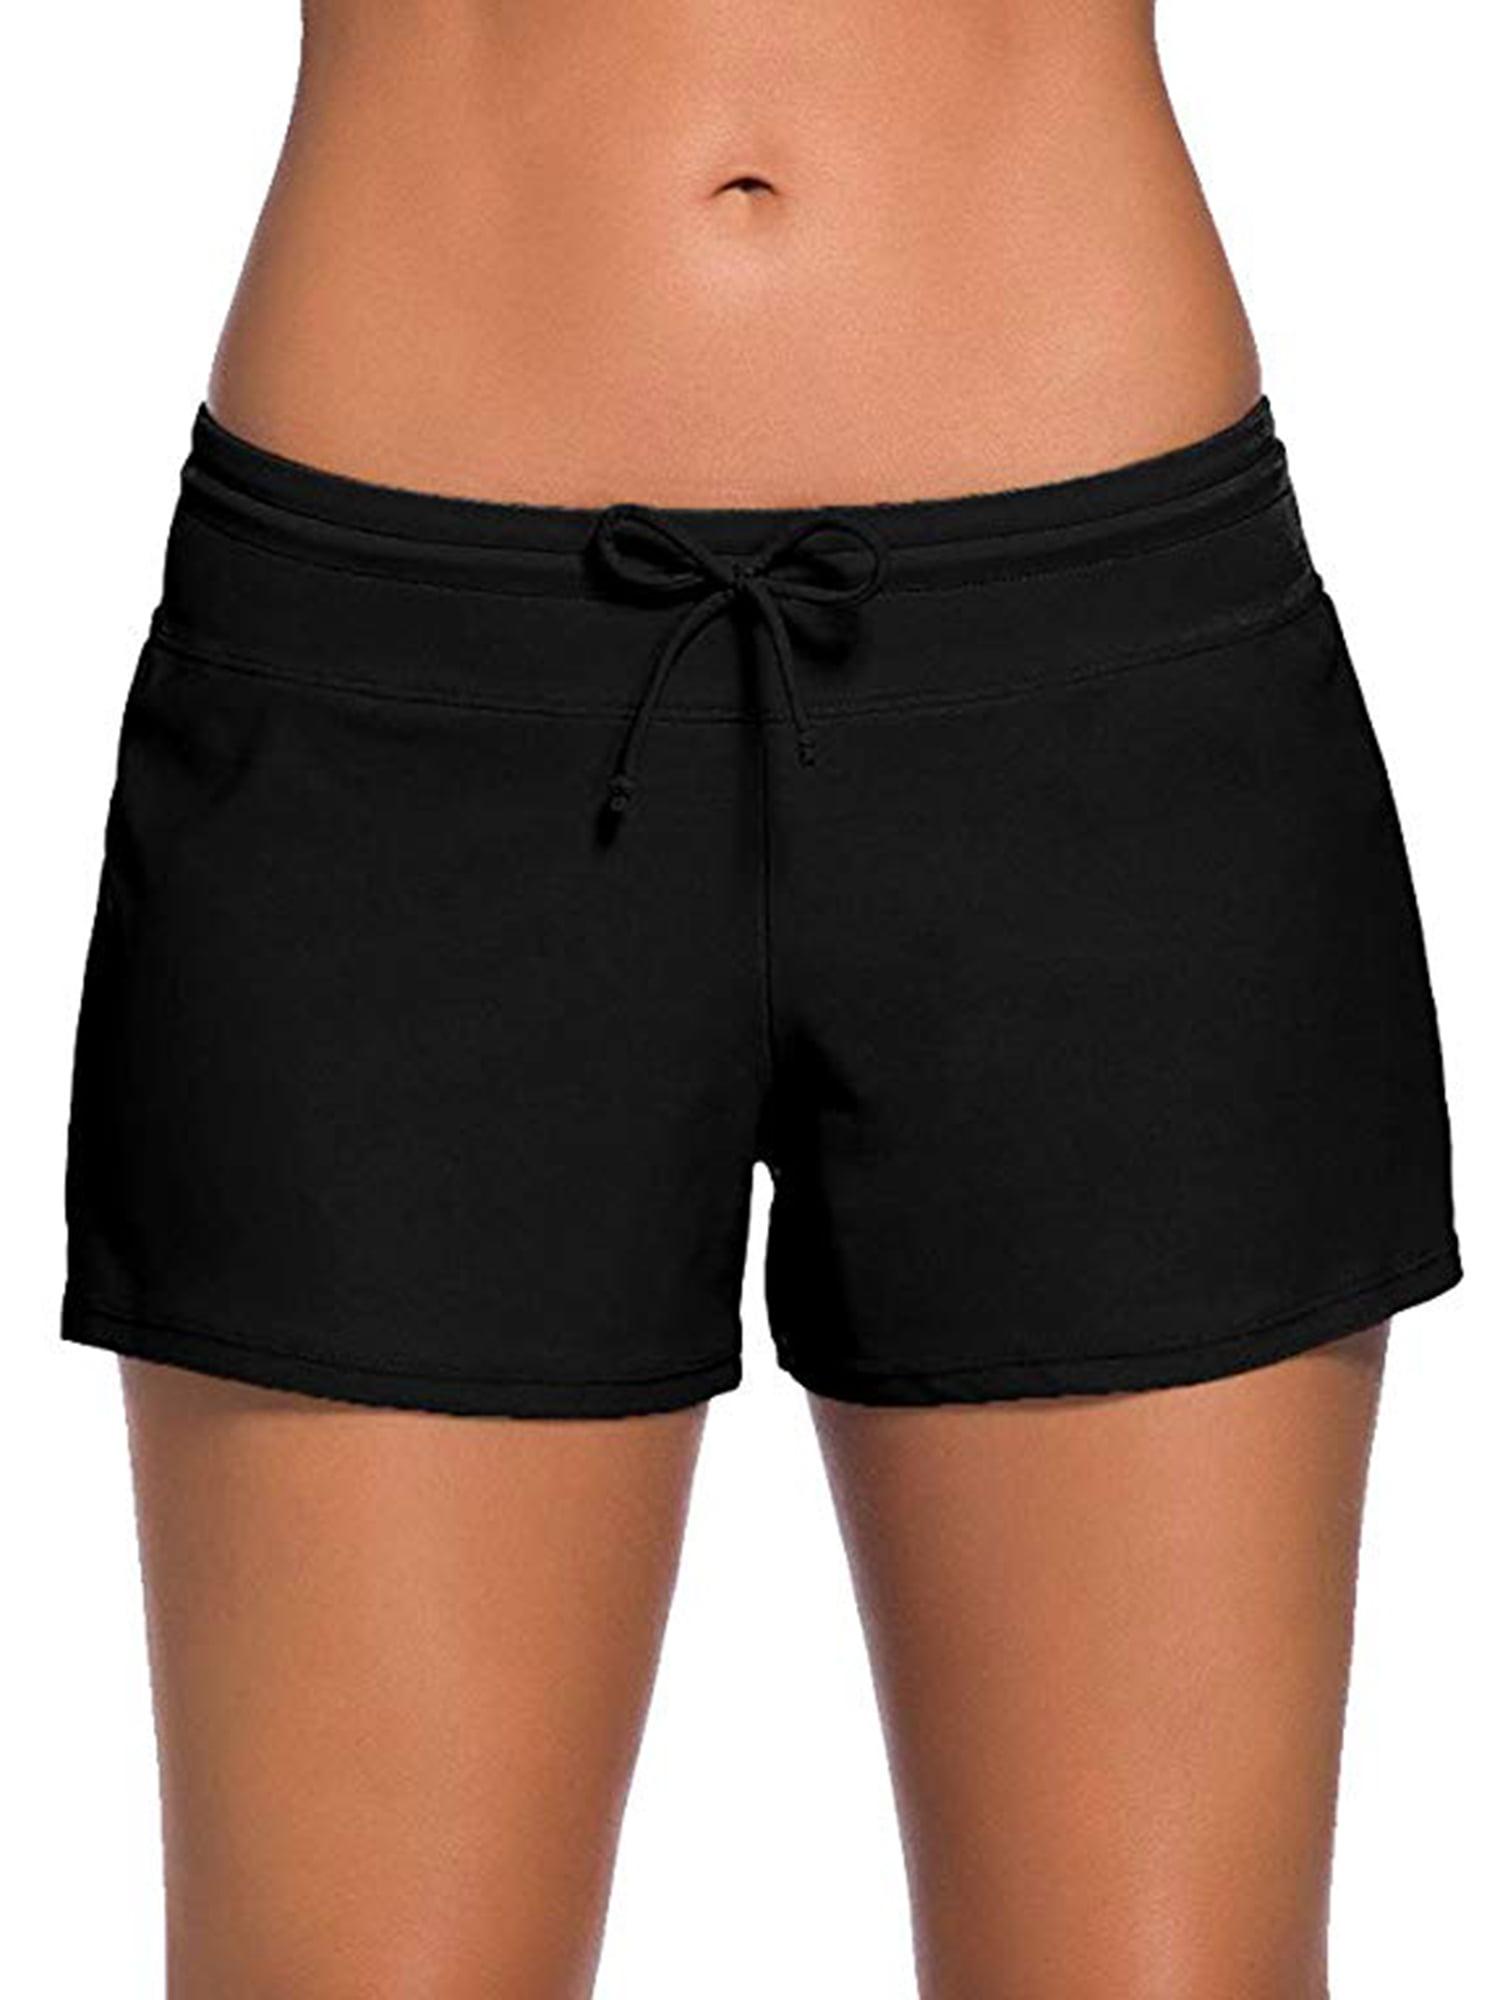 Kids Sportwear Quick Dry Solid Swimming Trunks Side Split Shorts